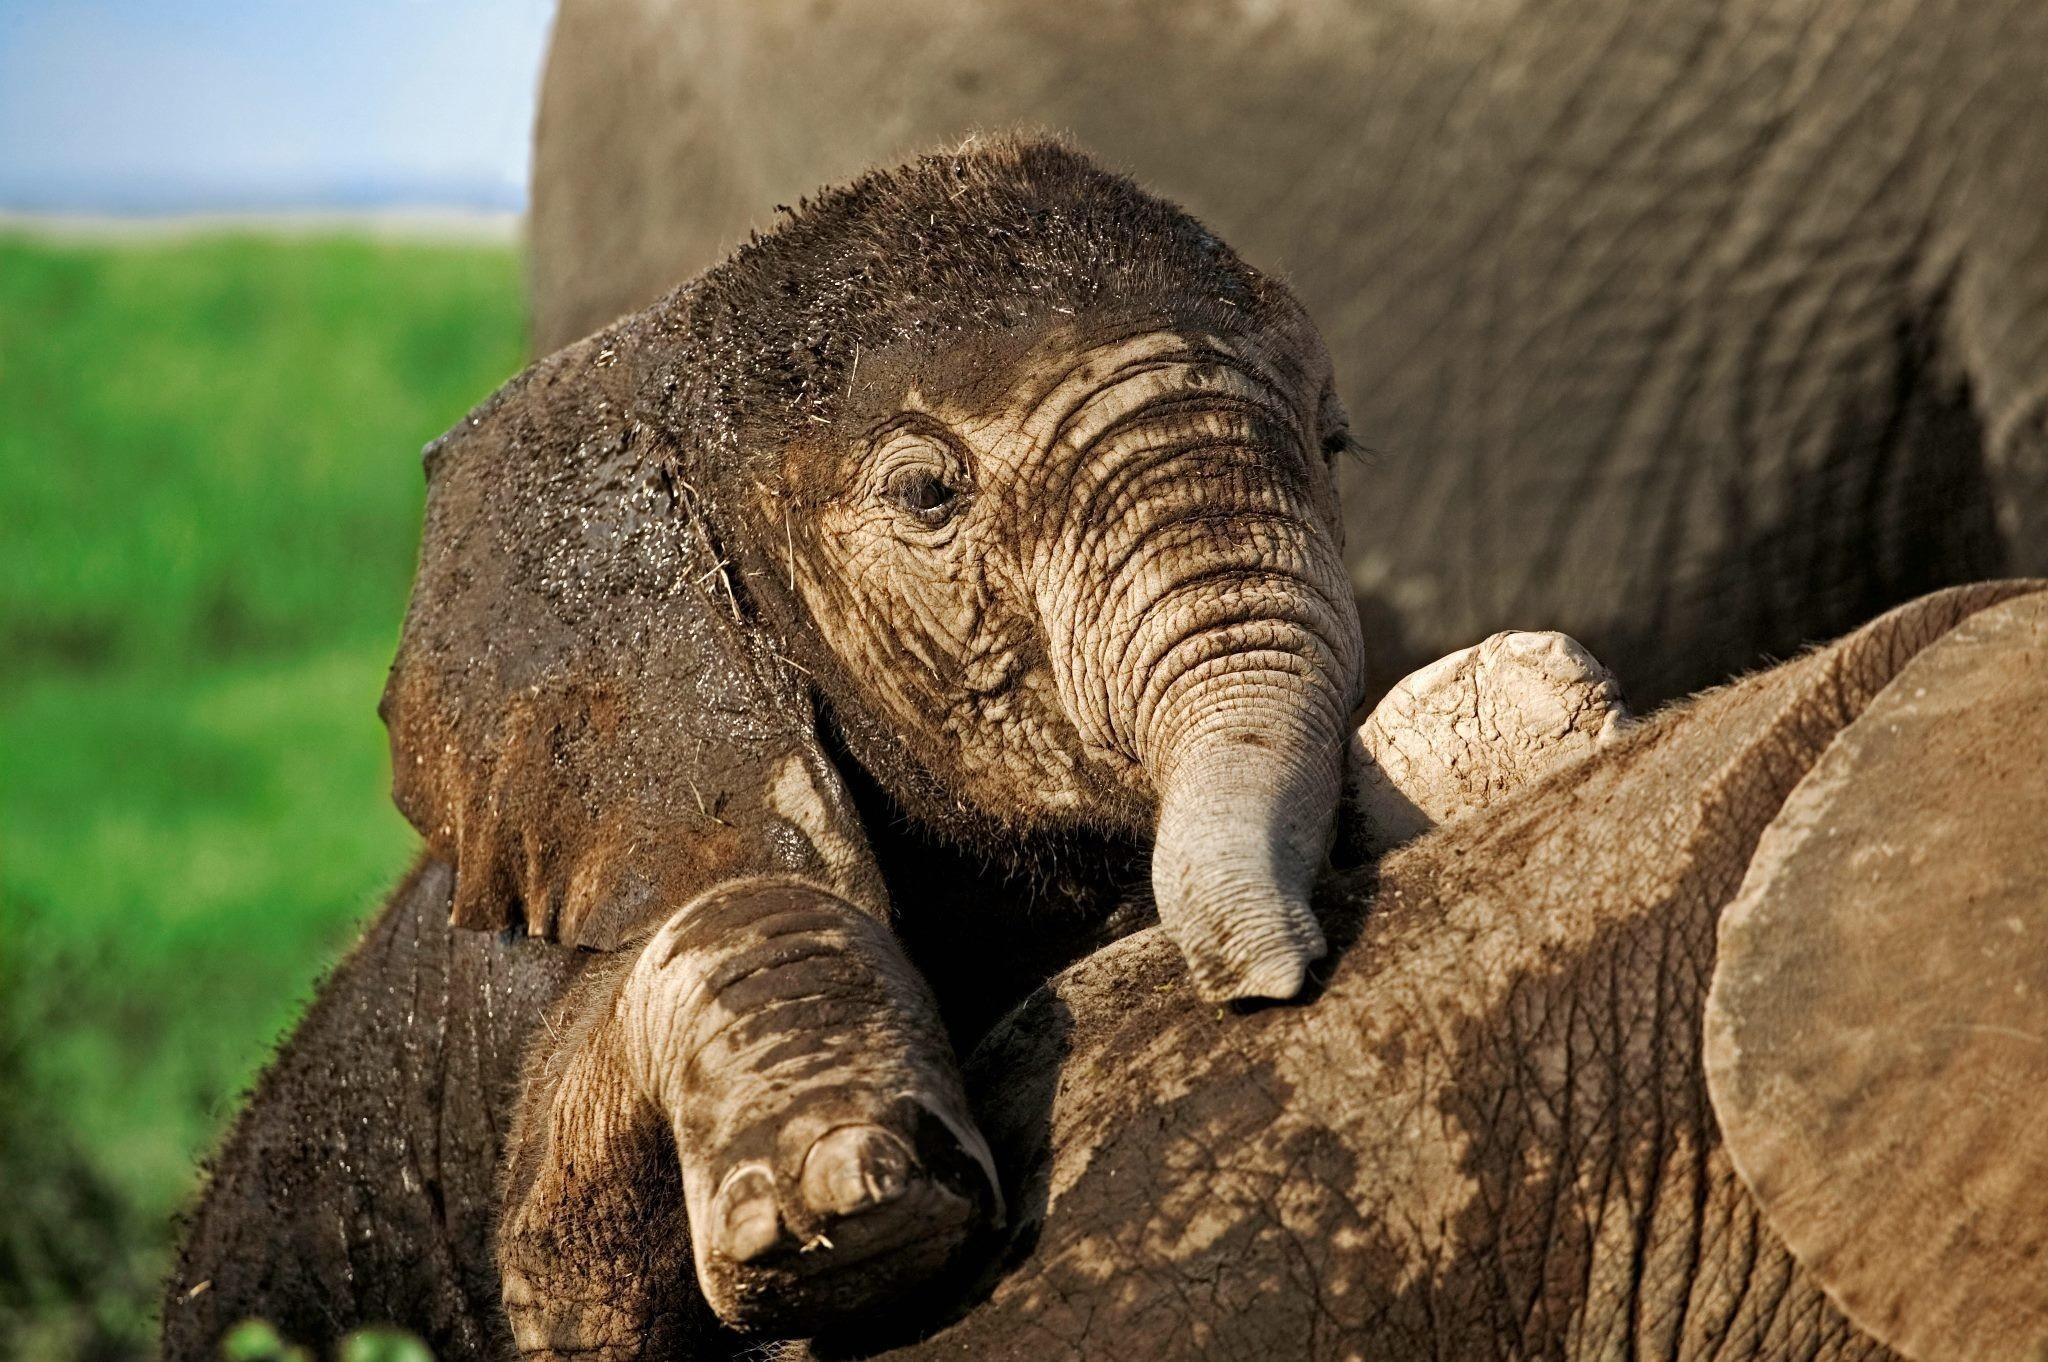 Hd wallpaper elephant - Hd Wallpaper Background Id 342827 2048x1362 Animal Elephant